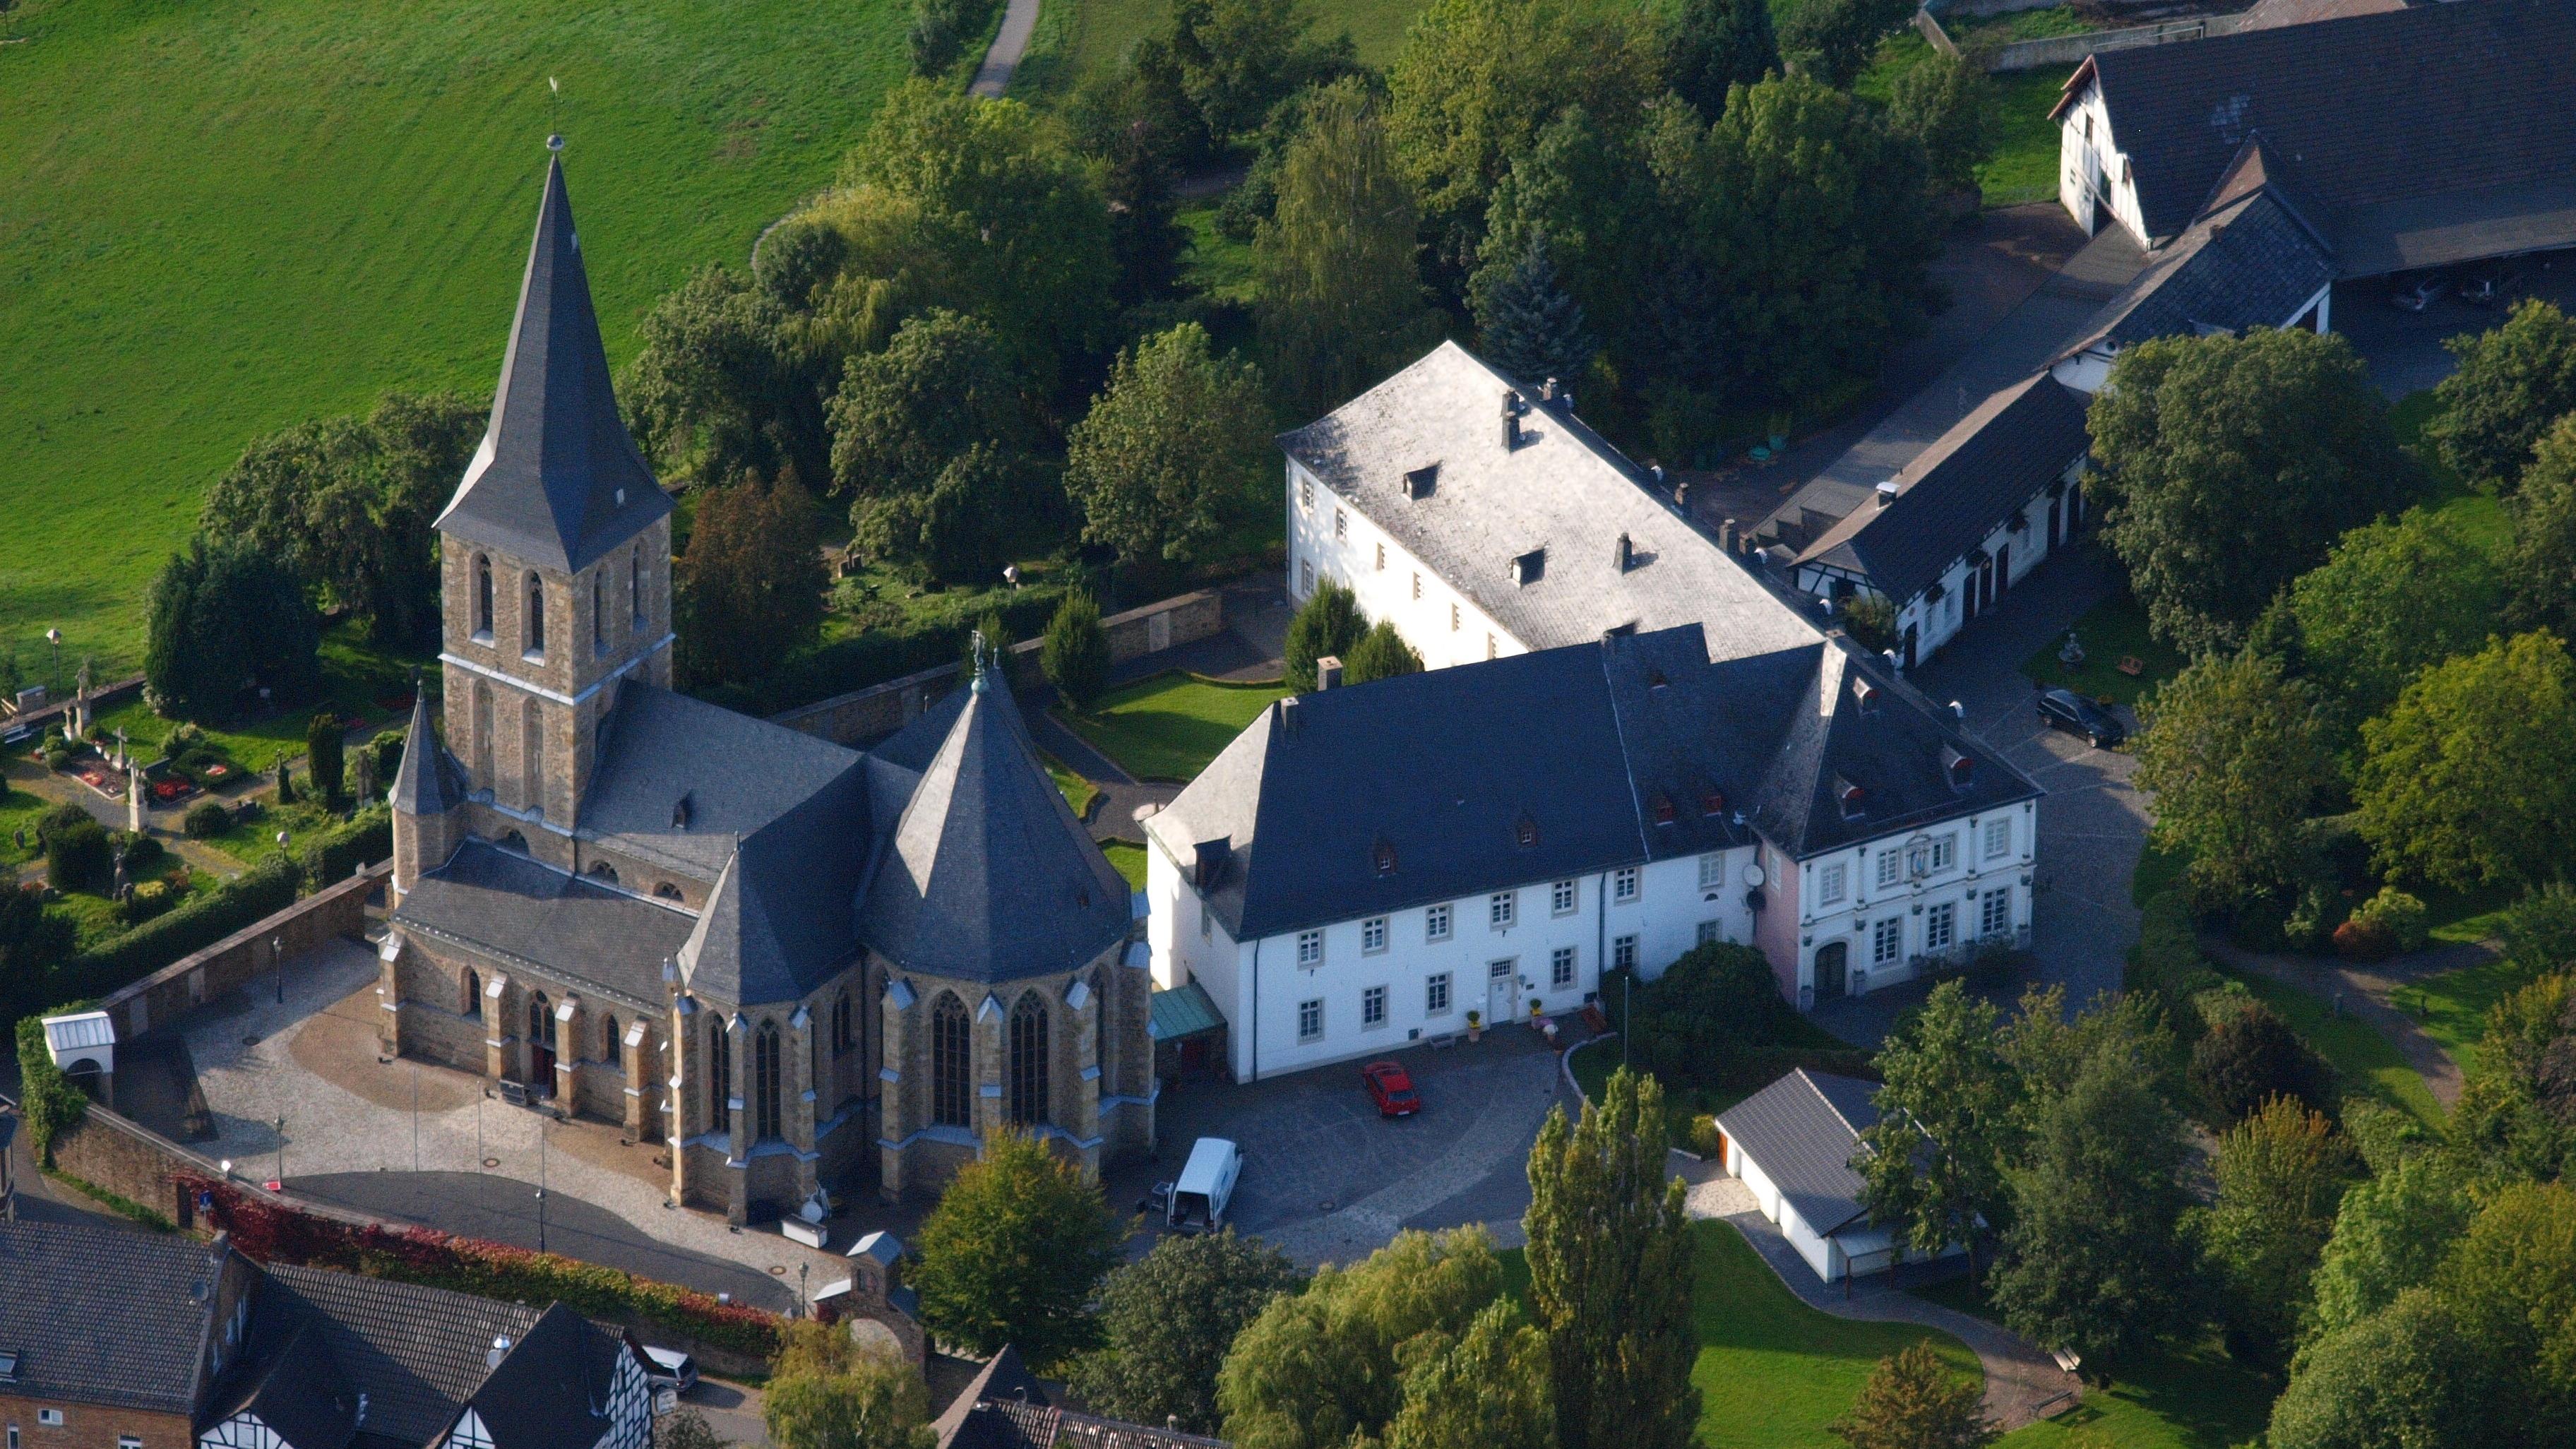 File:Hennef Bödingen, Kirche-.JPG - Wikimedia Commons